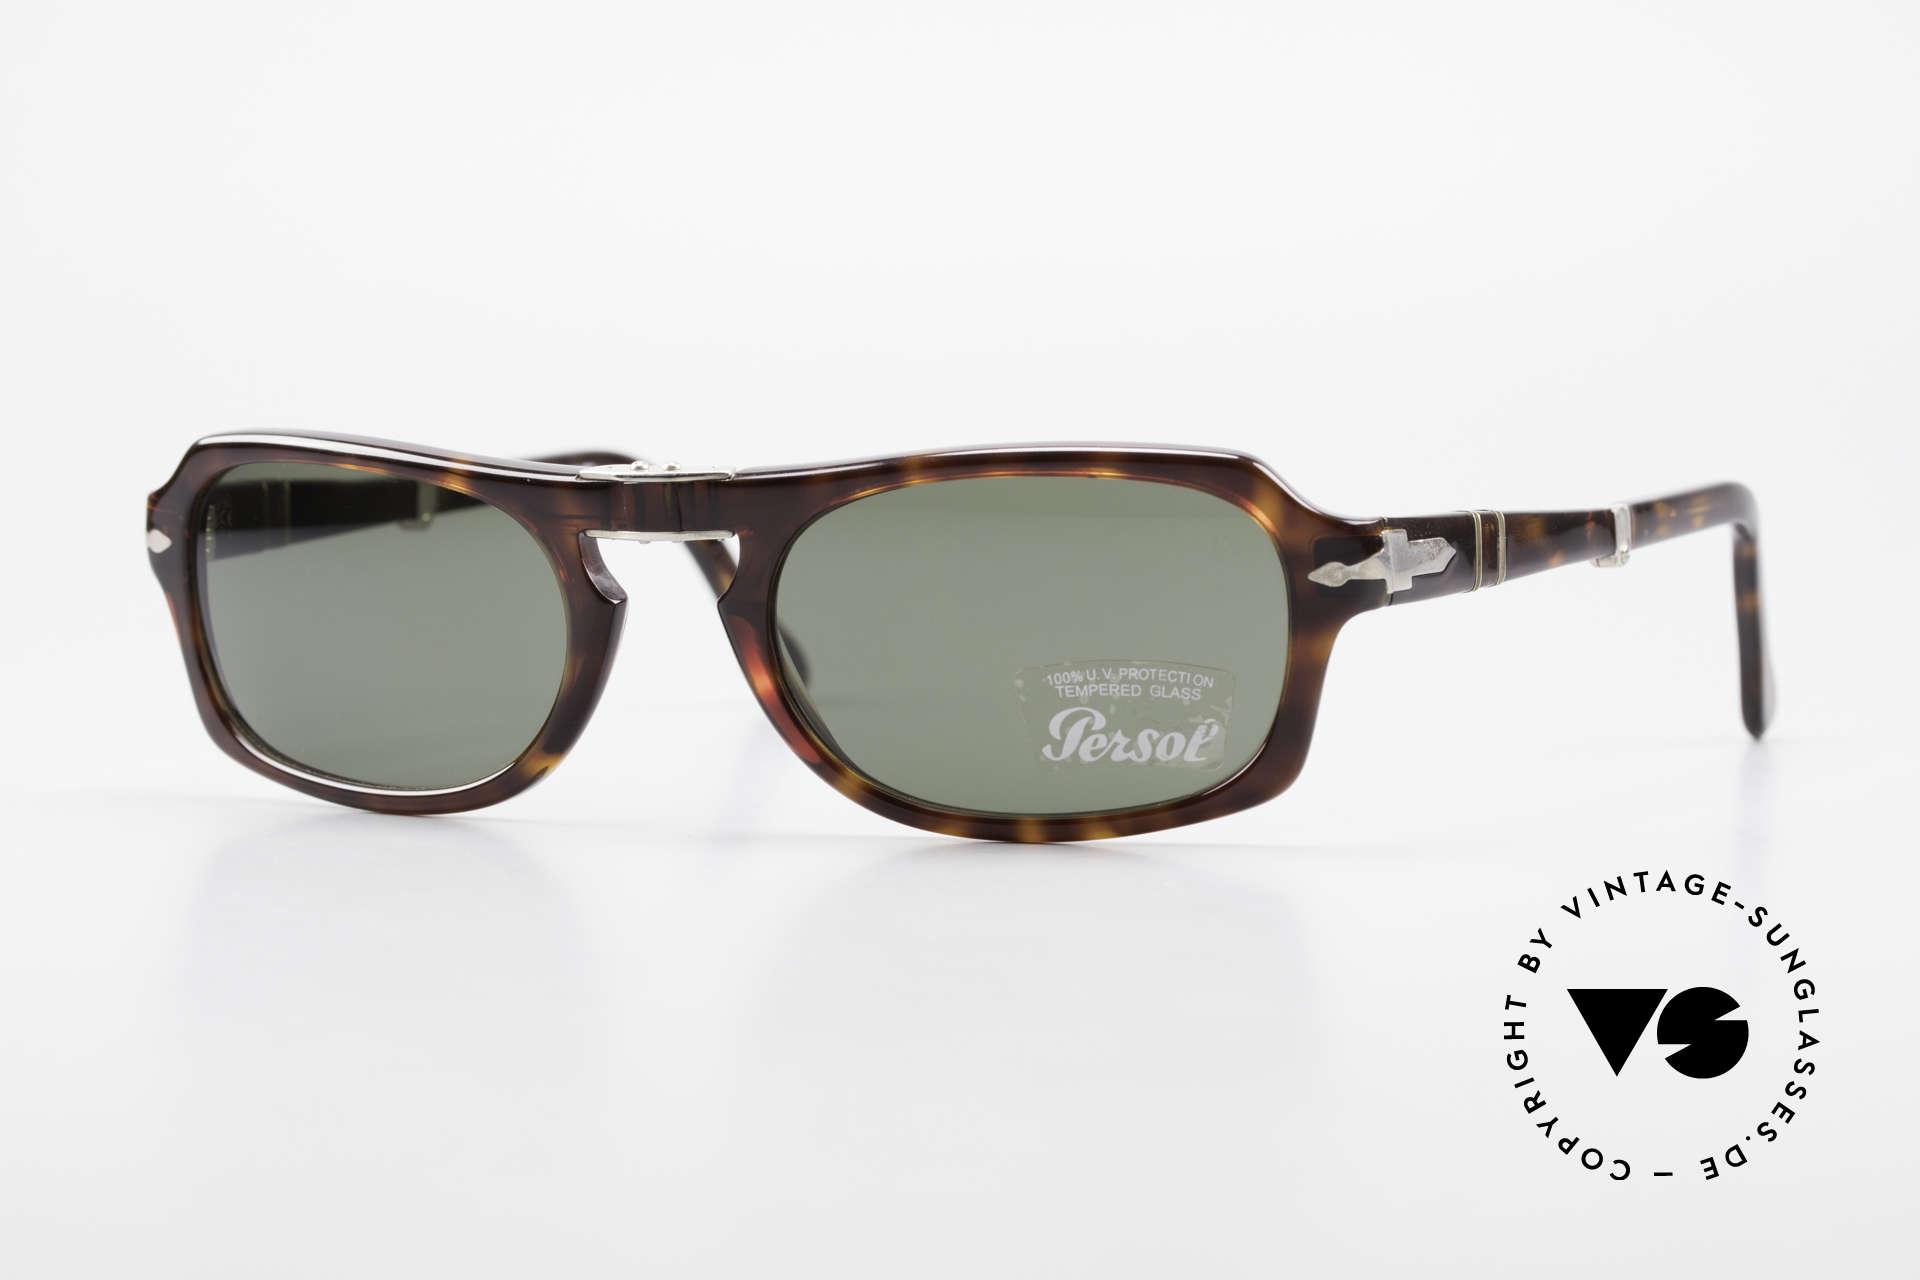 Persol 2621 Folding Faltbare Sonnenbrille Herren, Persol 2621 Folding: neue markante Faltbrille, Gr. 54/21, Passend für Herren